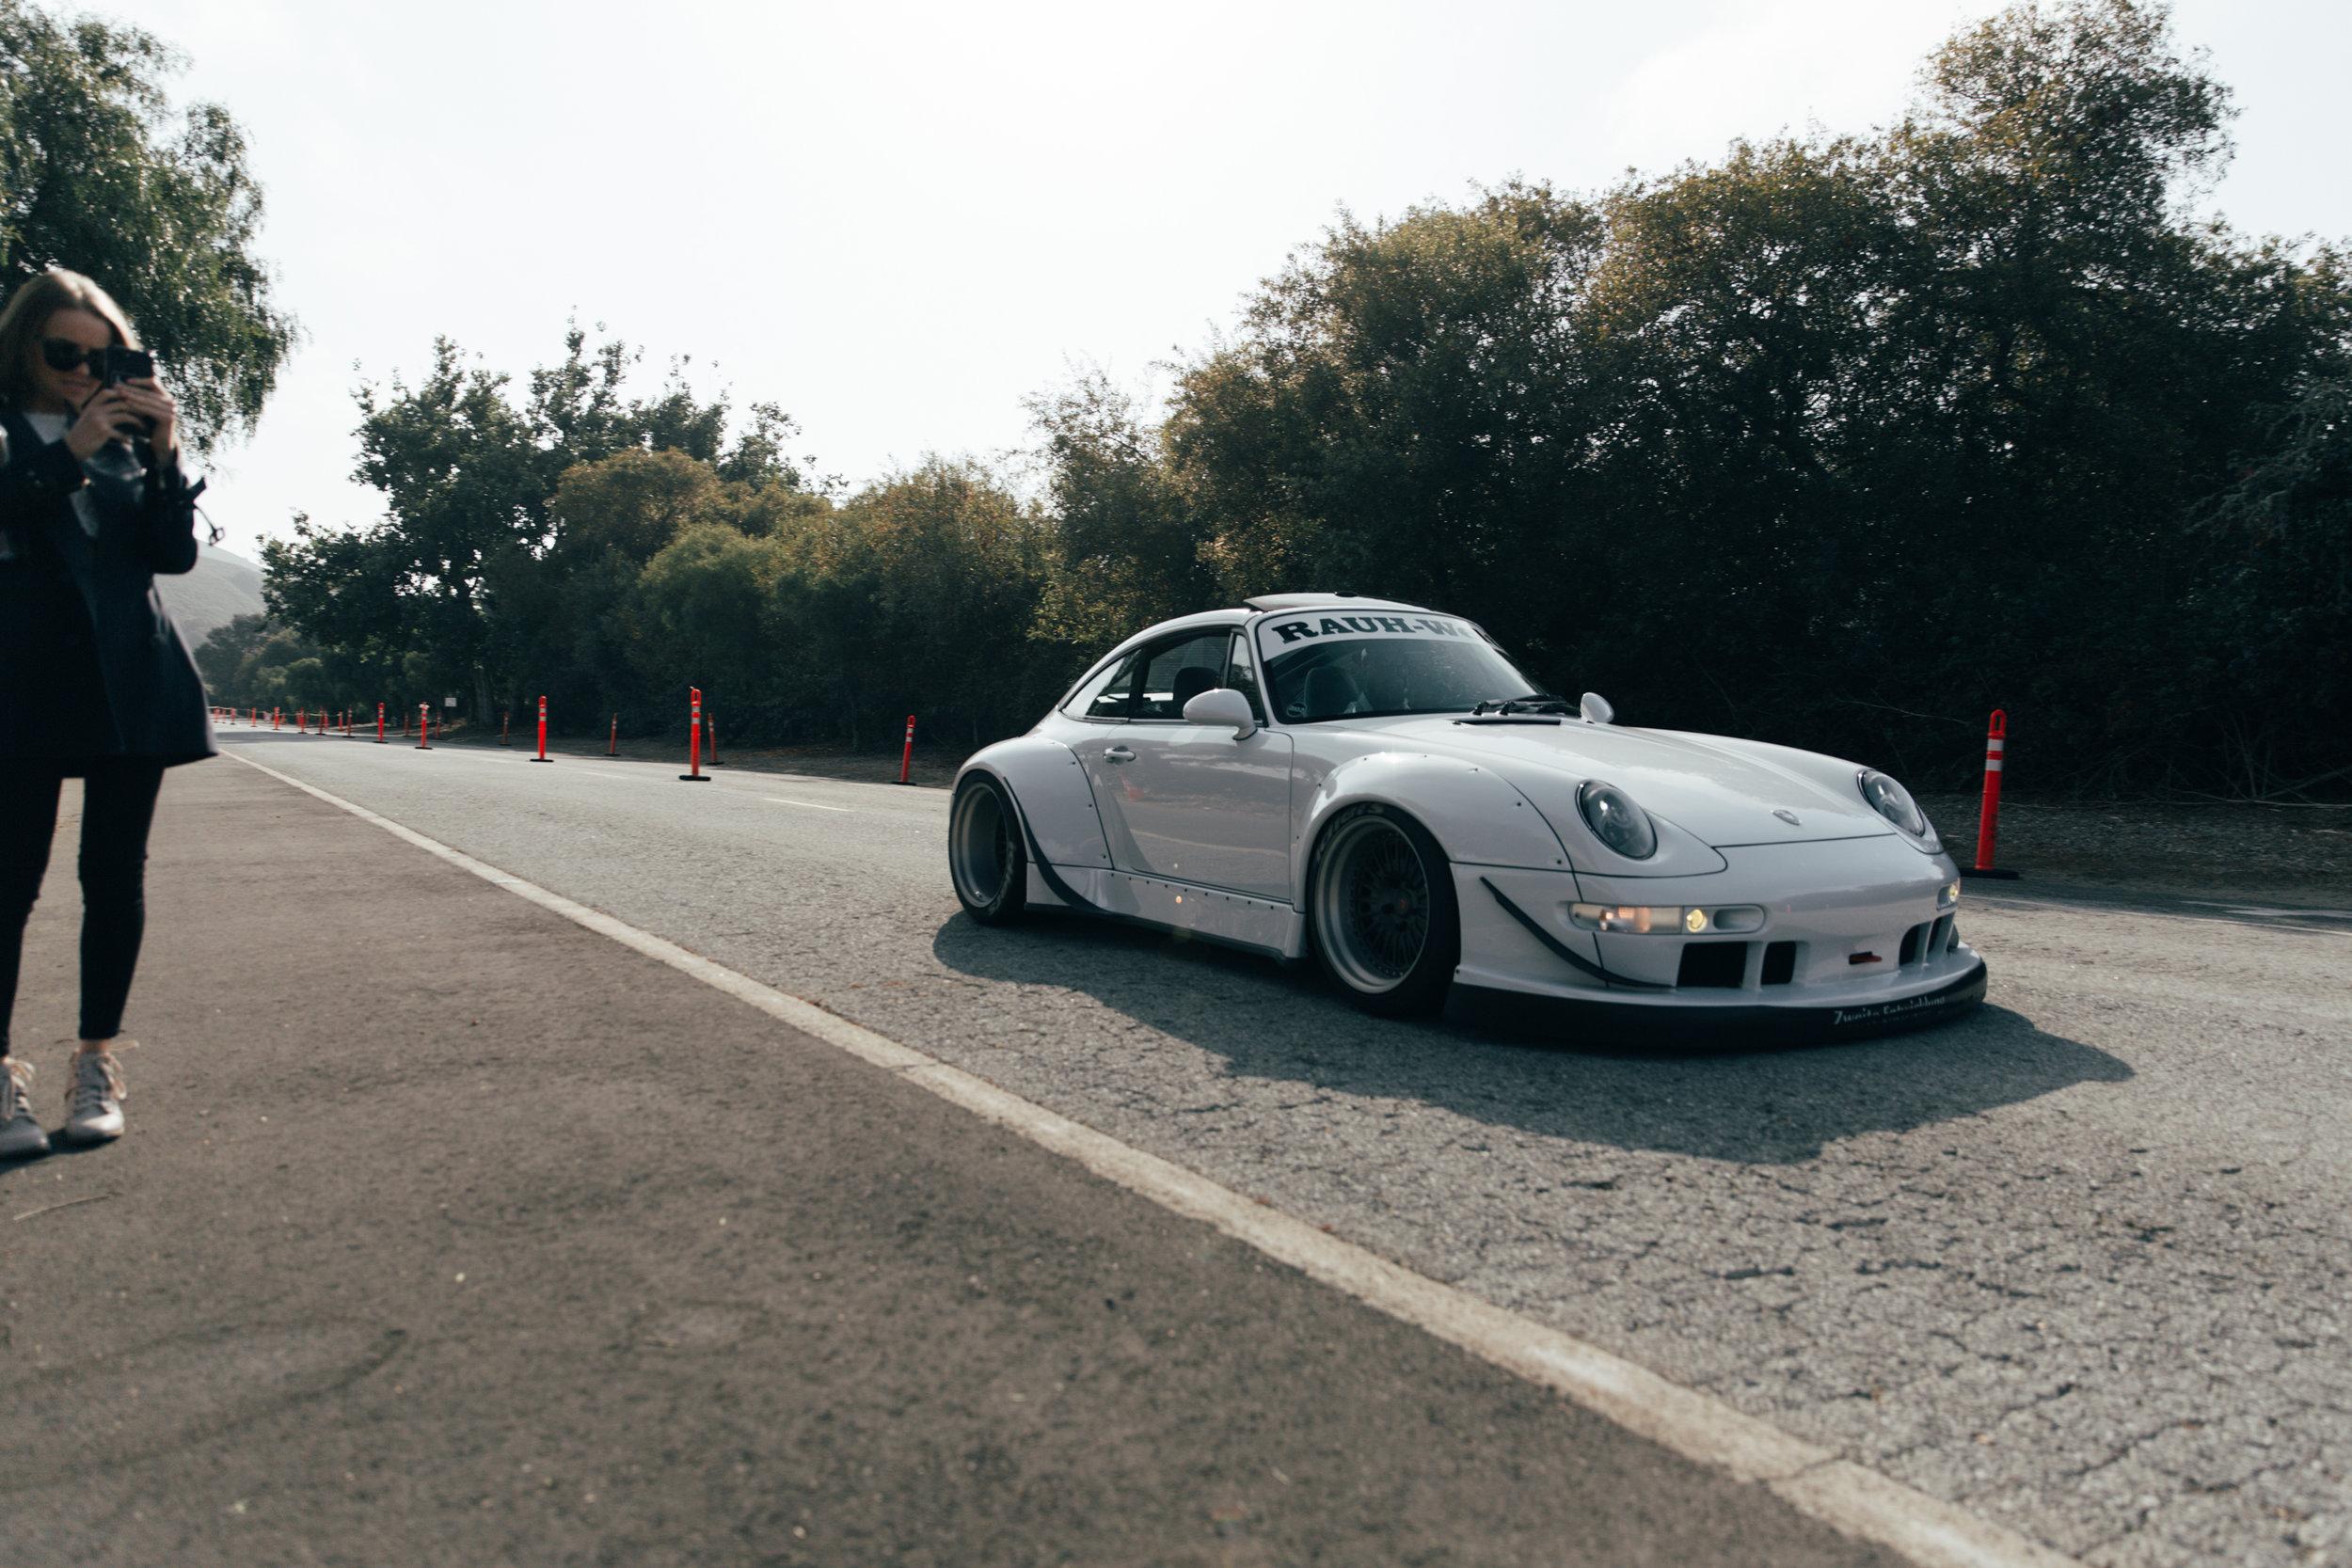 Stay_Driven_Monterey_Car_Week_6-1.jpg